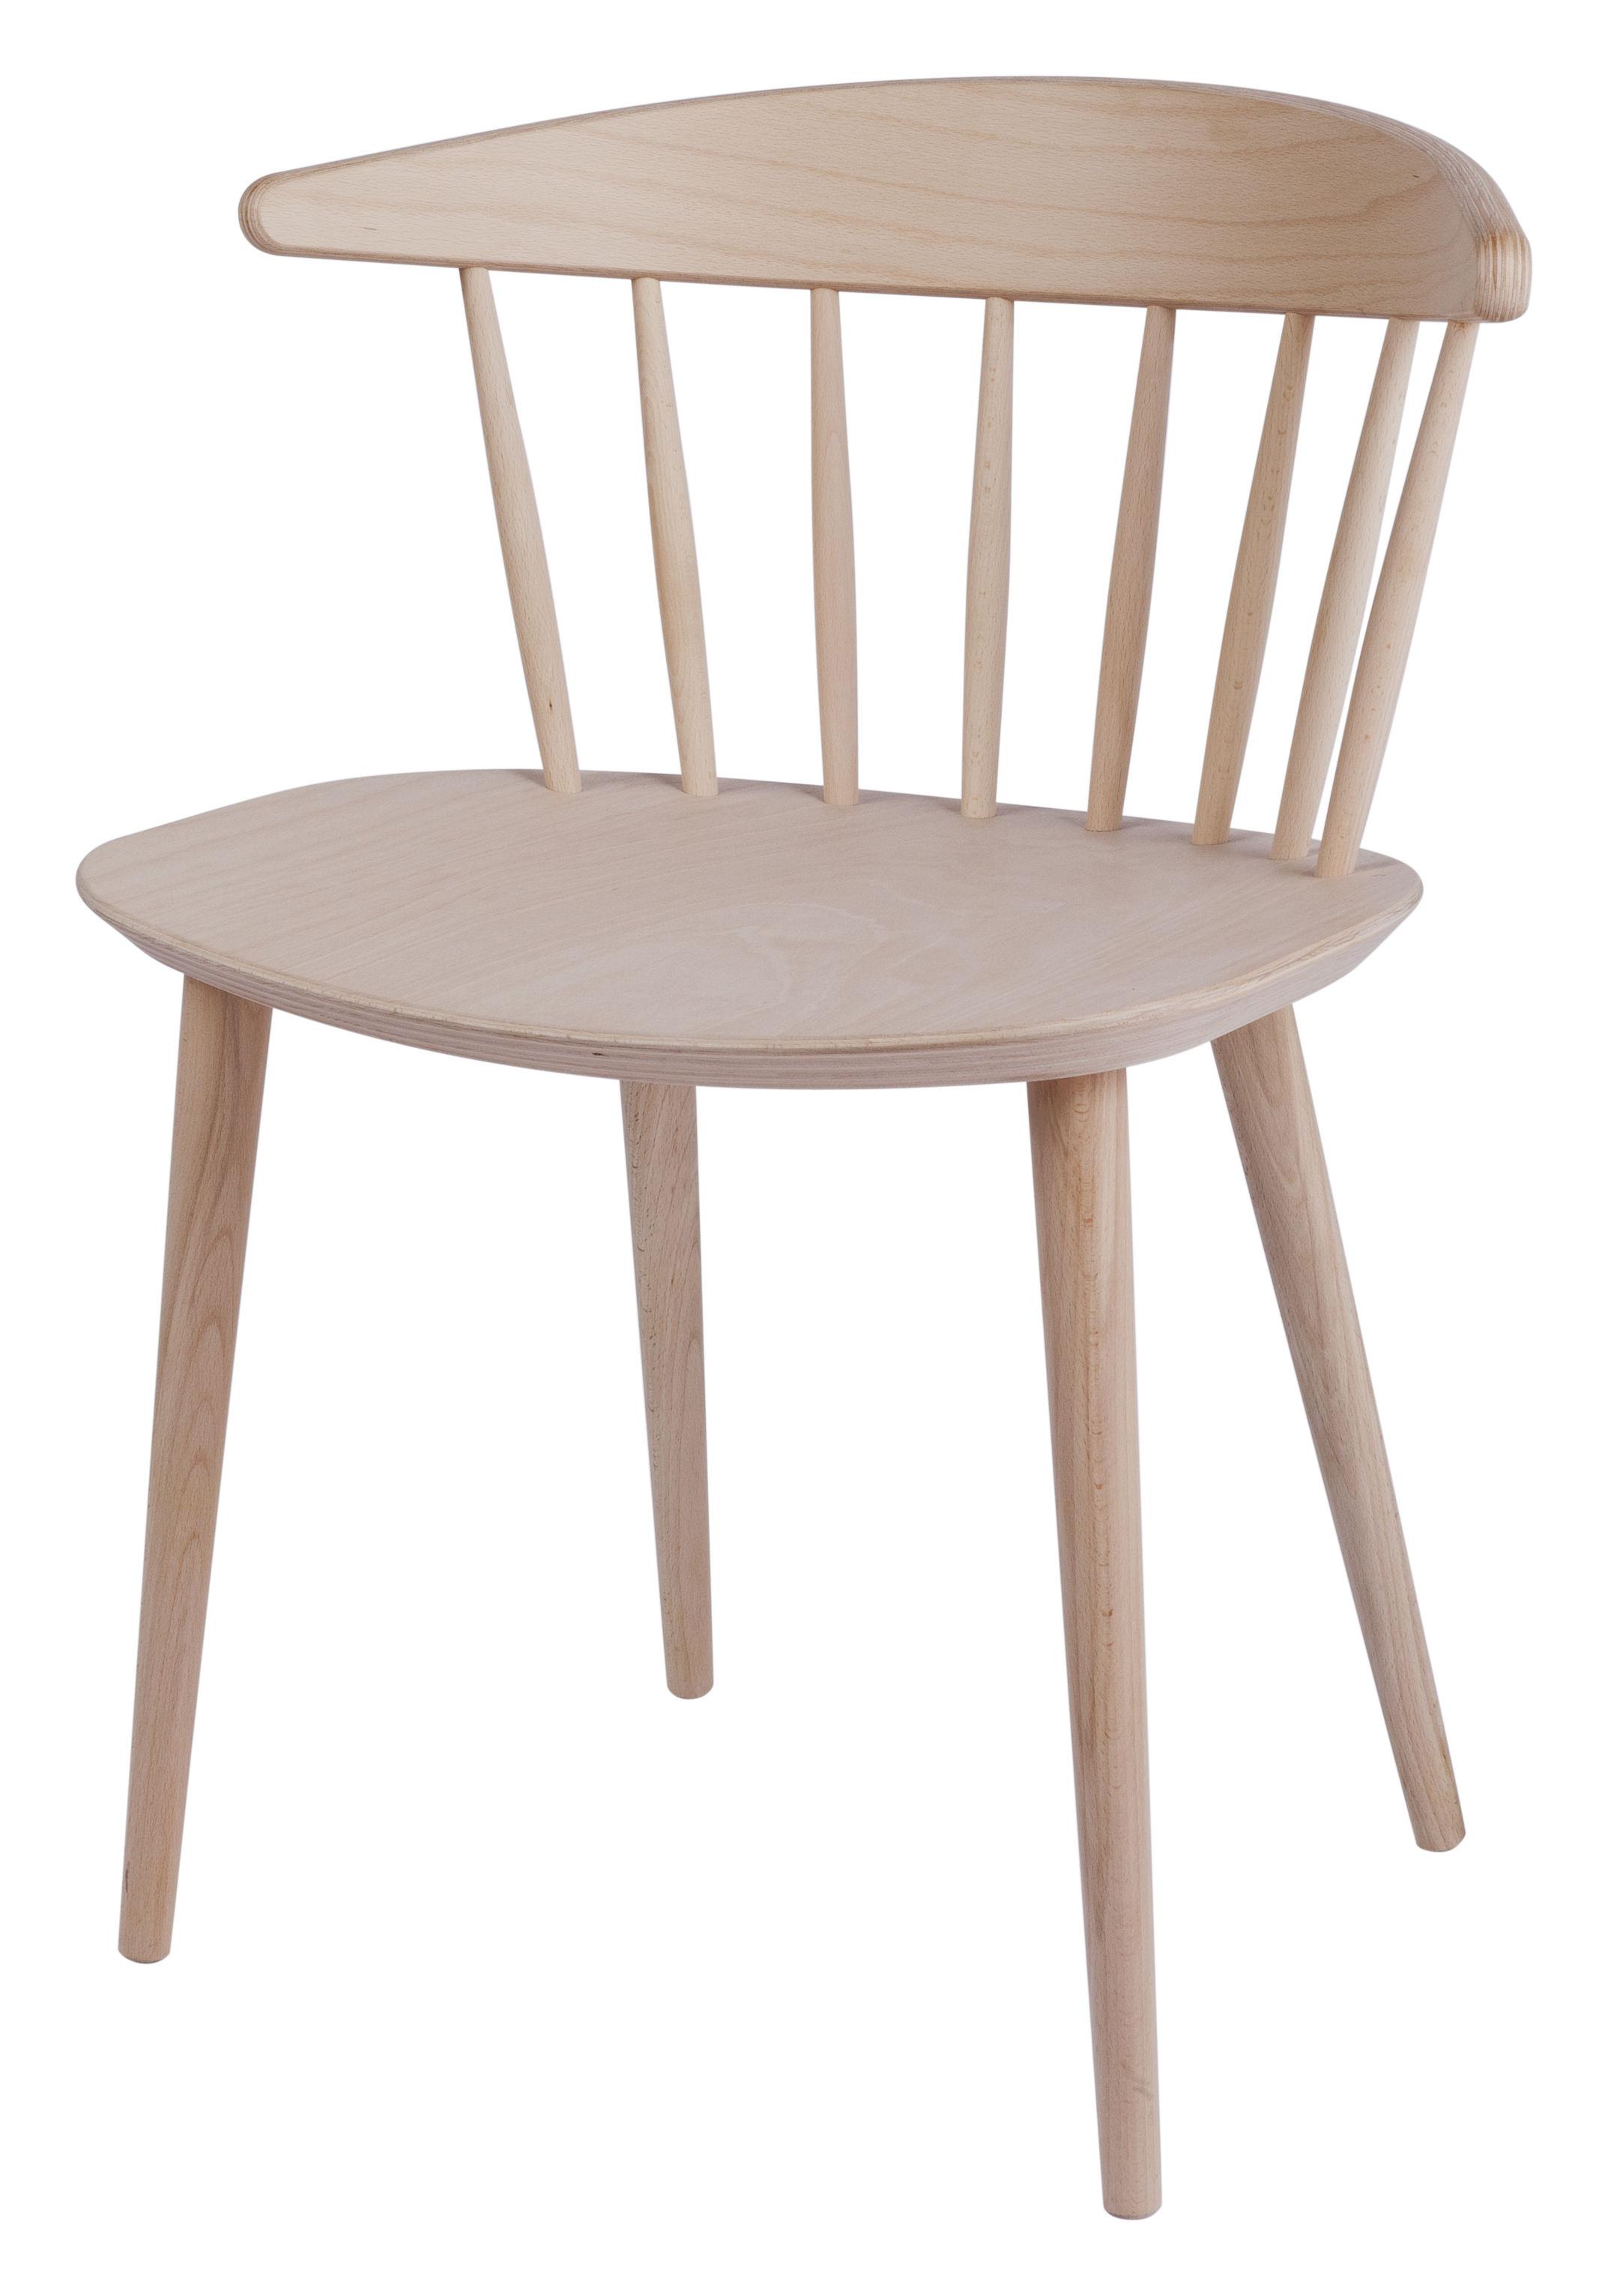 Möbel - Stühle  - J104 Stuhl - Hay - Holz hell - massive Buche